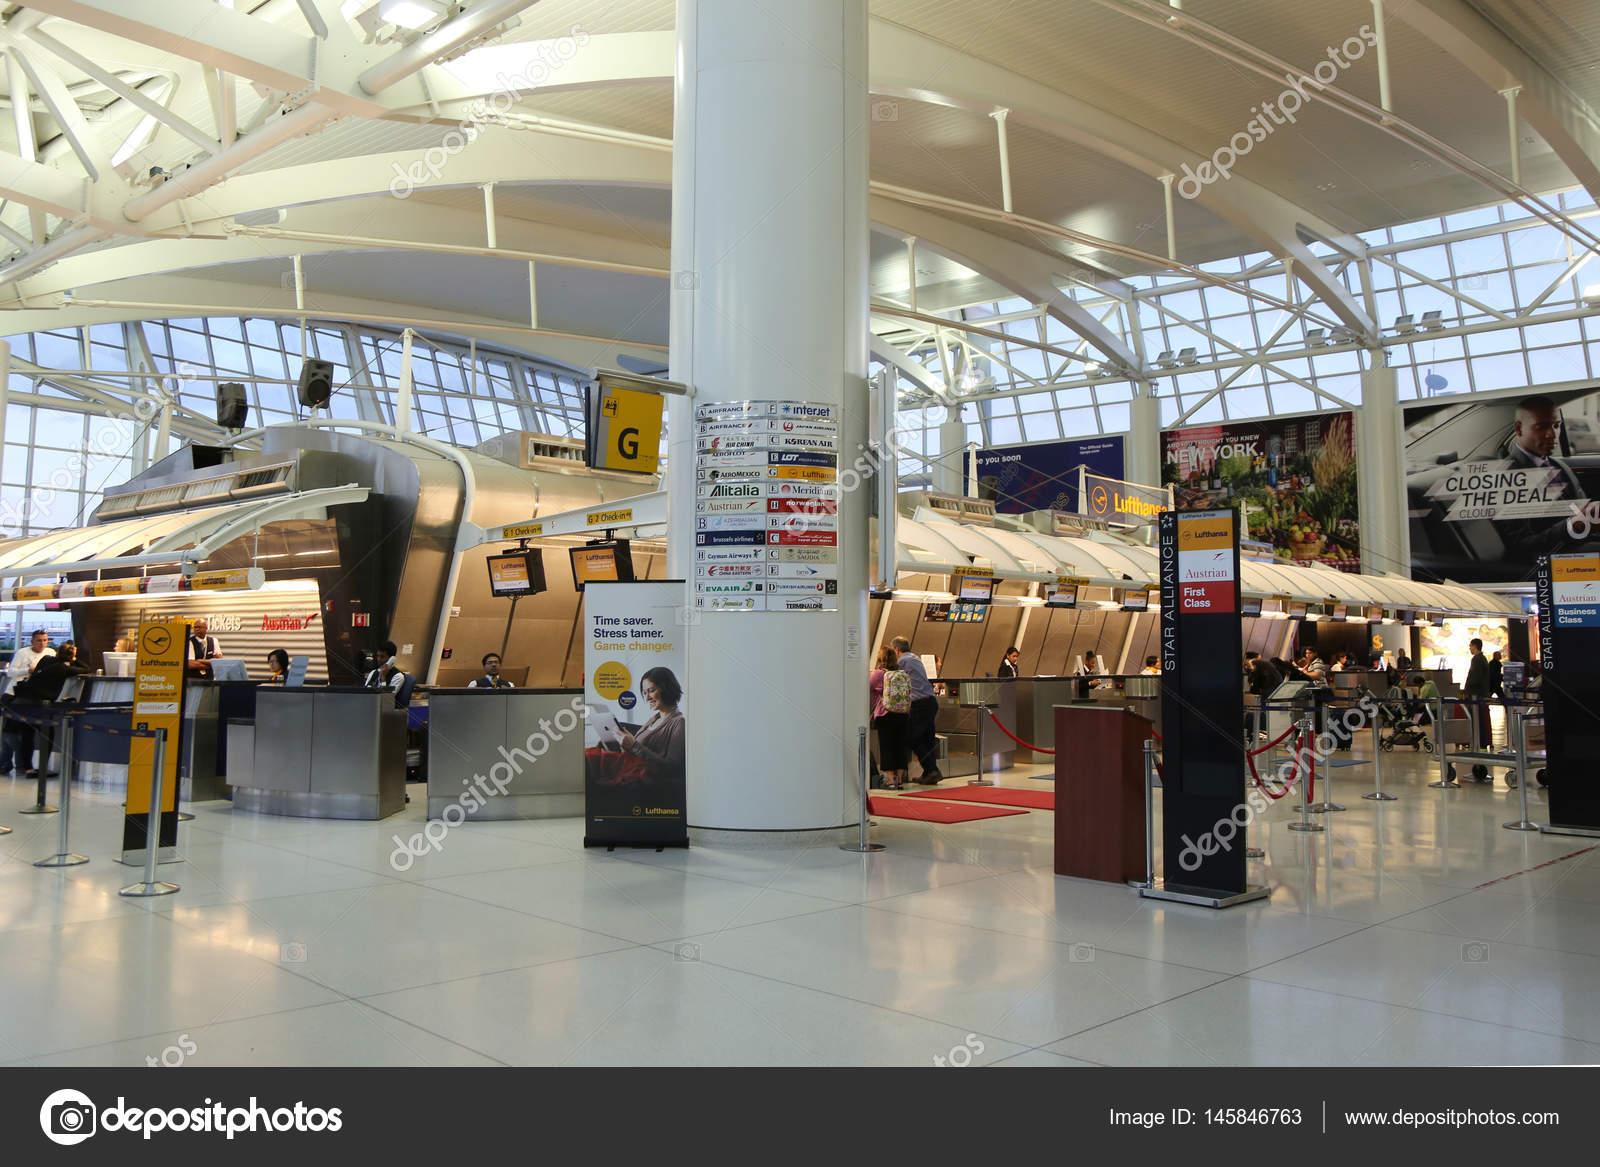 Aeroporto Jfk : Dentro do terminal 1 no aeroporto jfk em nova york u2014 fotografia de